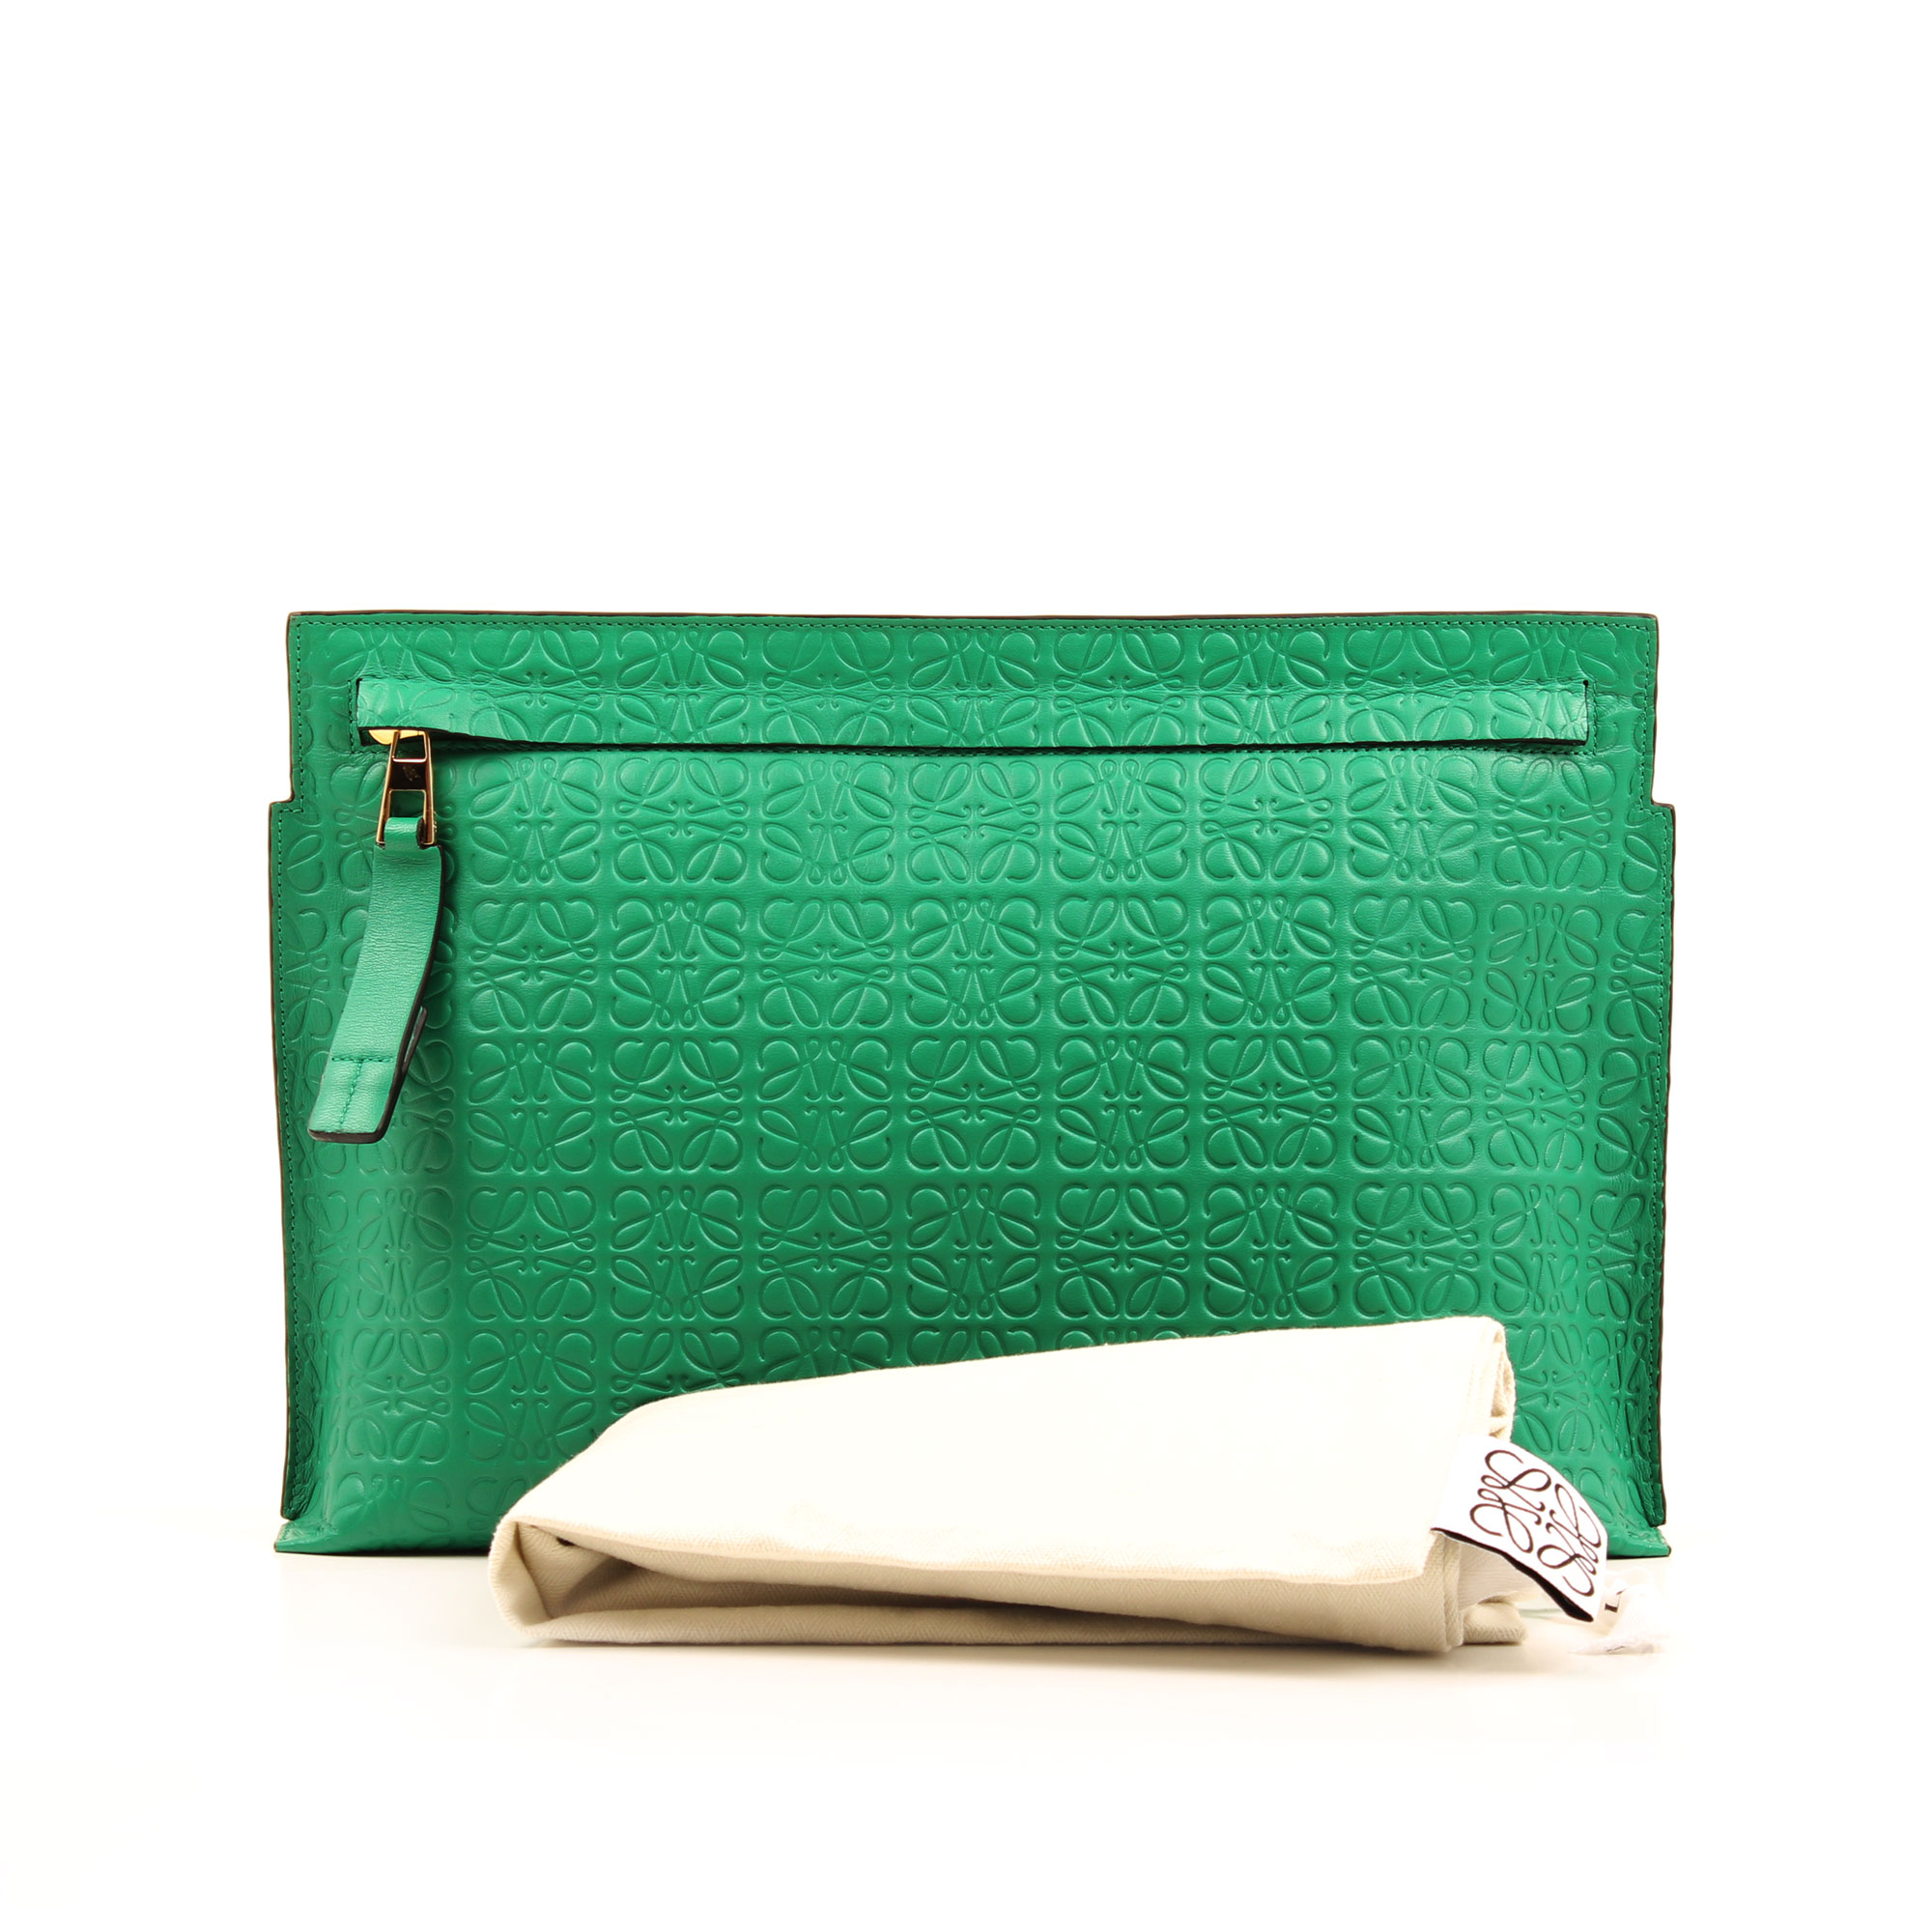 Imagen del dustbag del bolso clutch loewe t pouch verde embossed